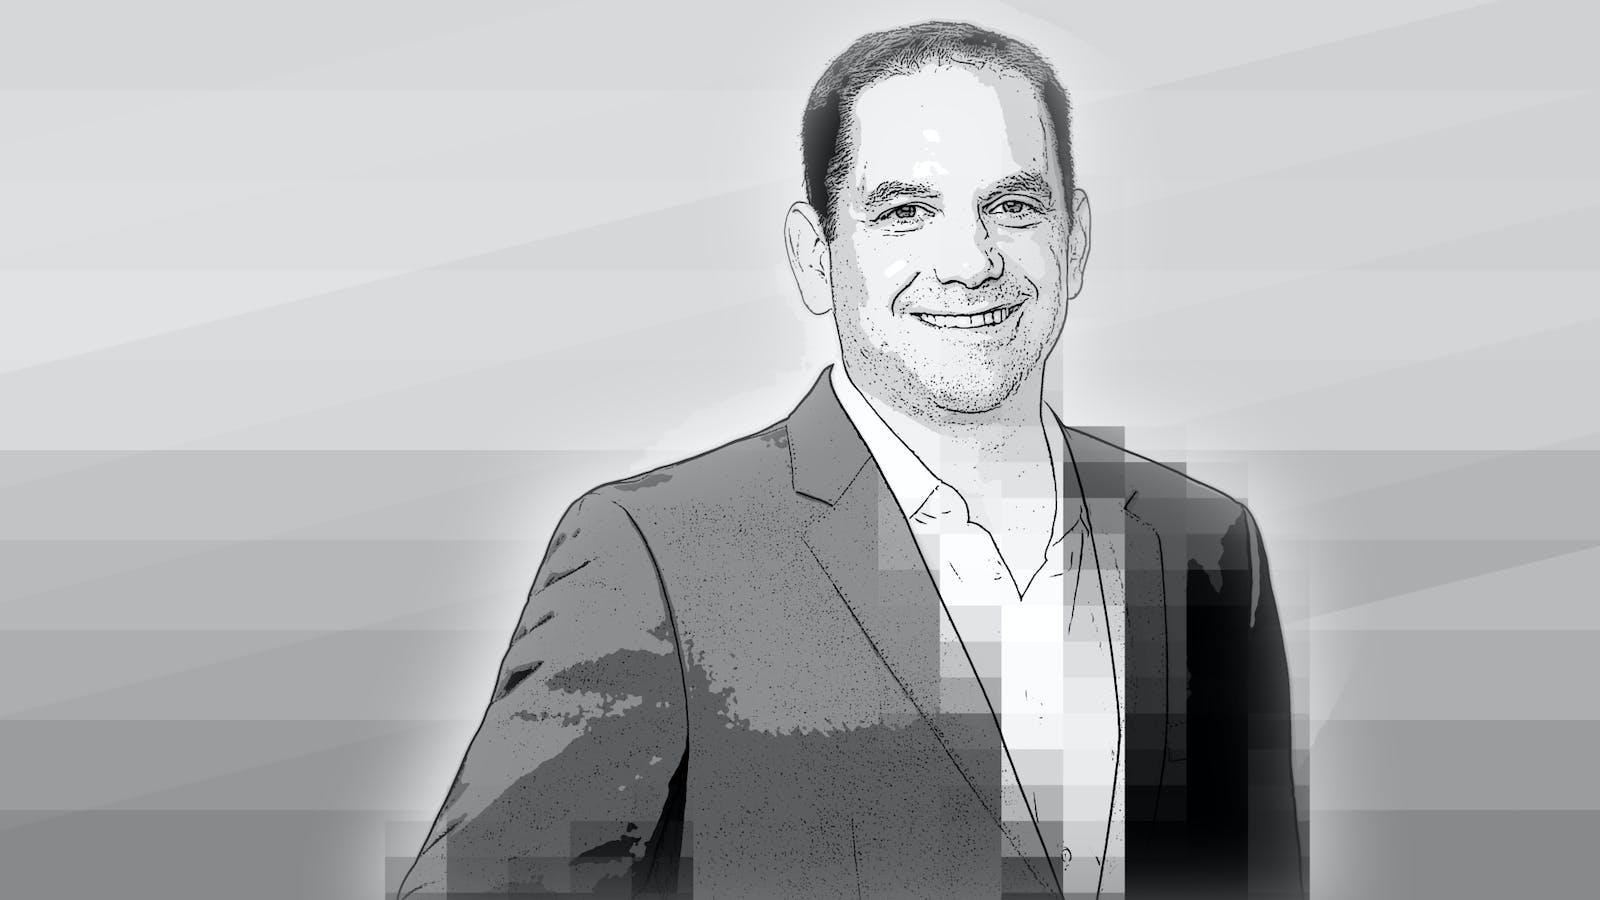 Andrew Morse, executive vice president of CNN US and head of CNN digital worldwide. Art by Matt Vascellaro.